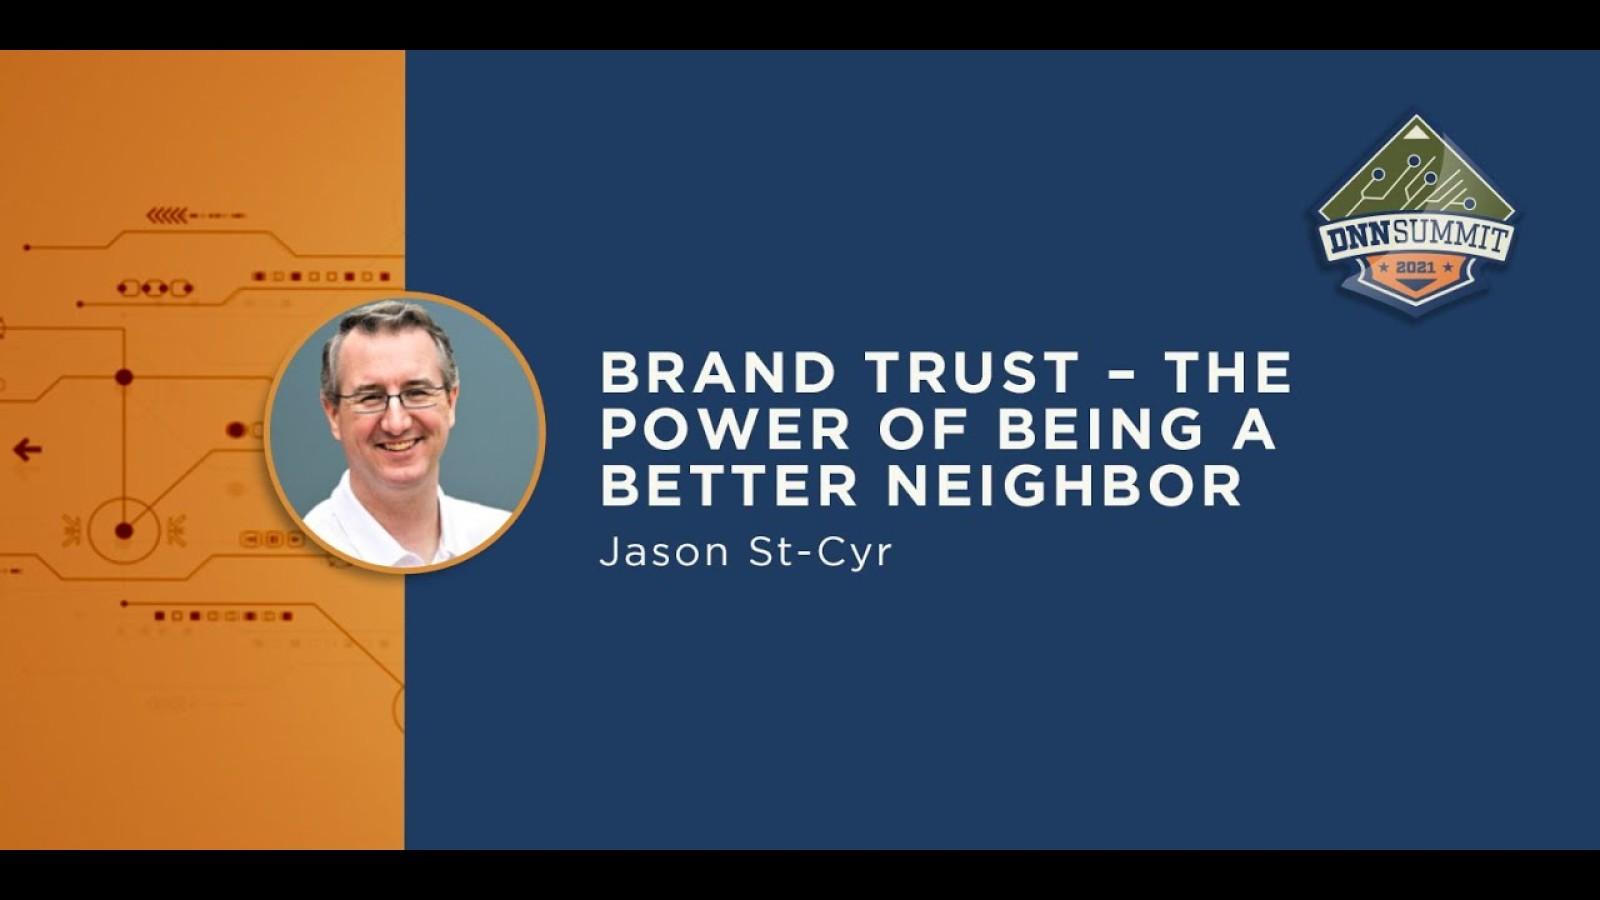 Brand Trust – The Power of Being a Better Neighbor